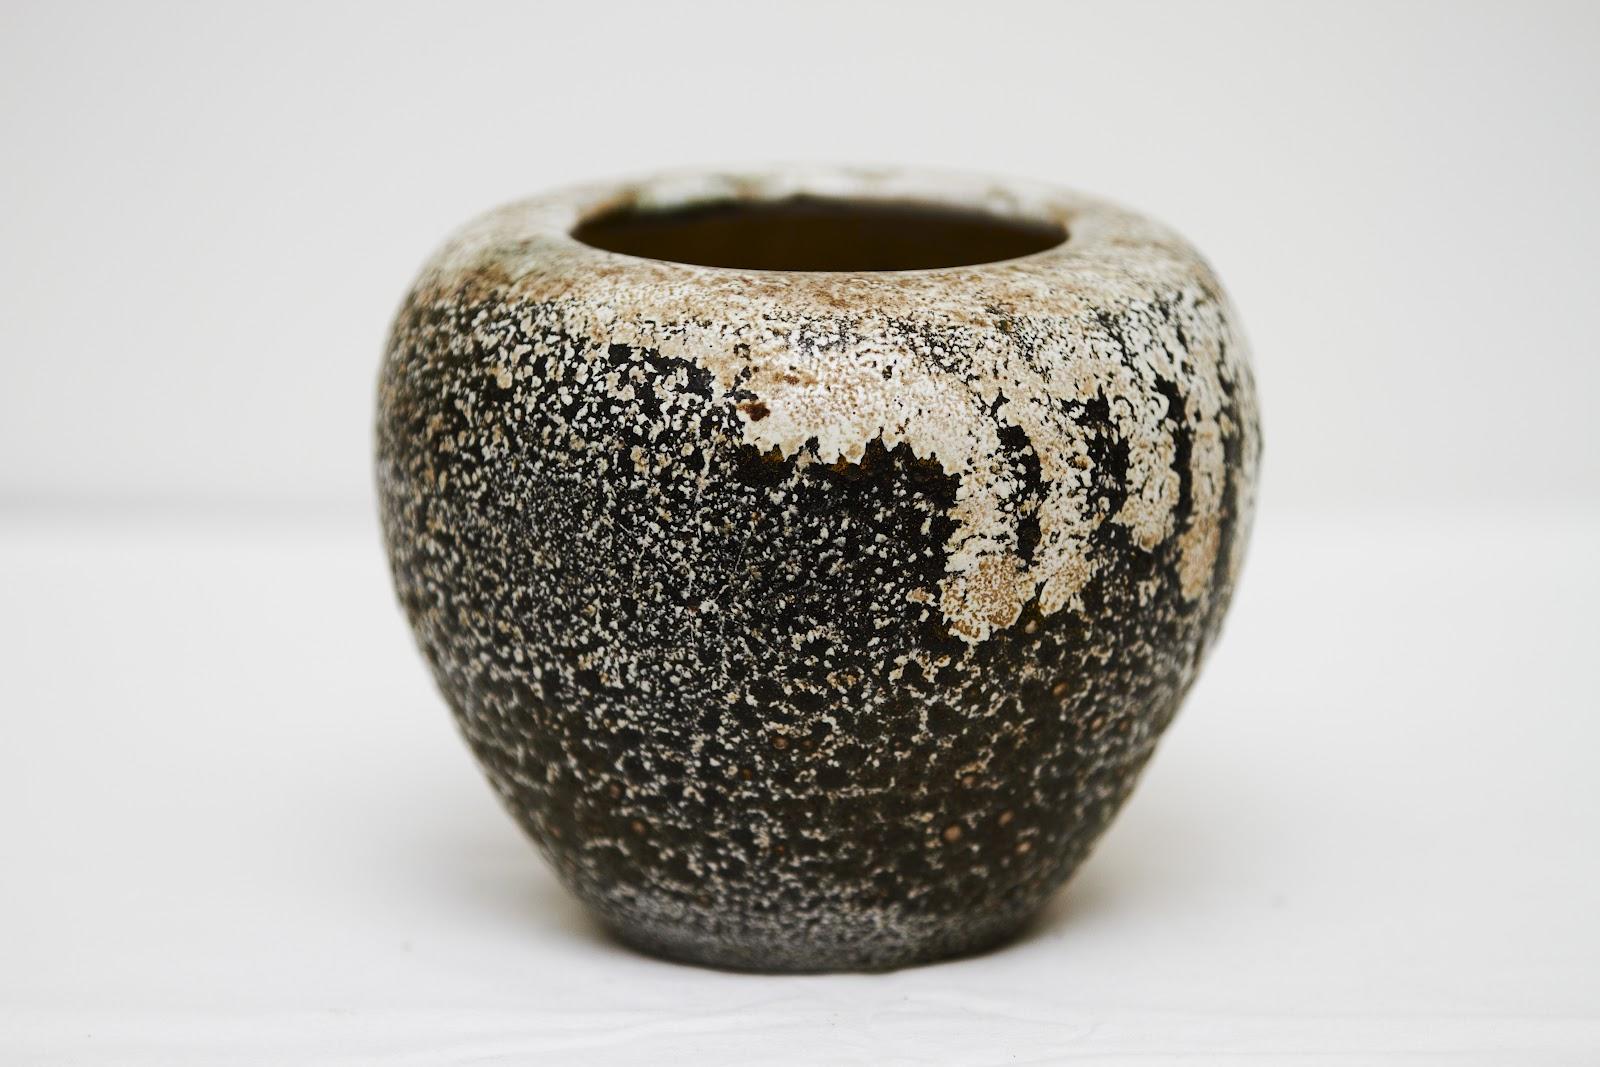 dagnæs keramik Black and white glaze vase, Dagnæs Keramik | Ceramics, early 20th  dagnæs keramik